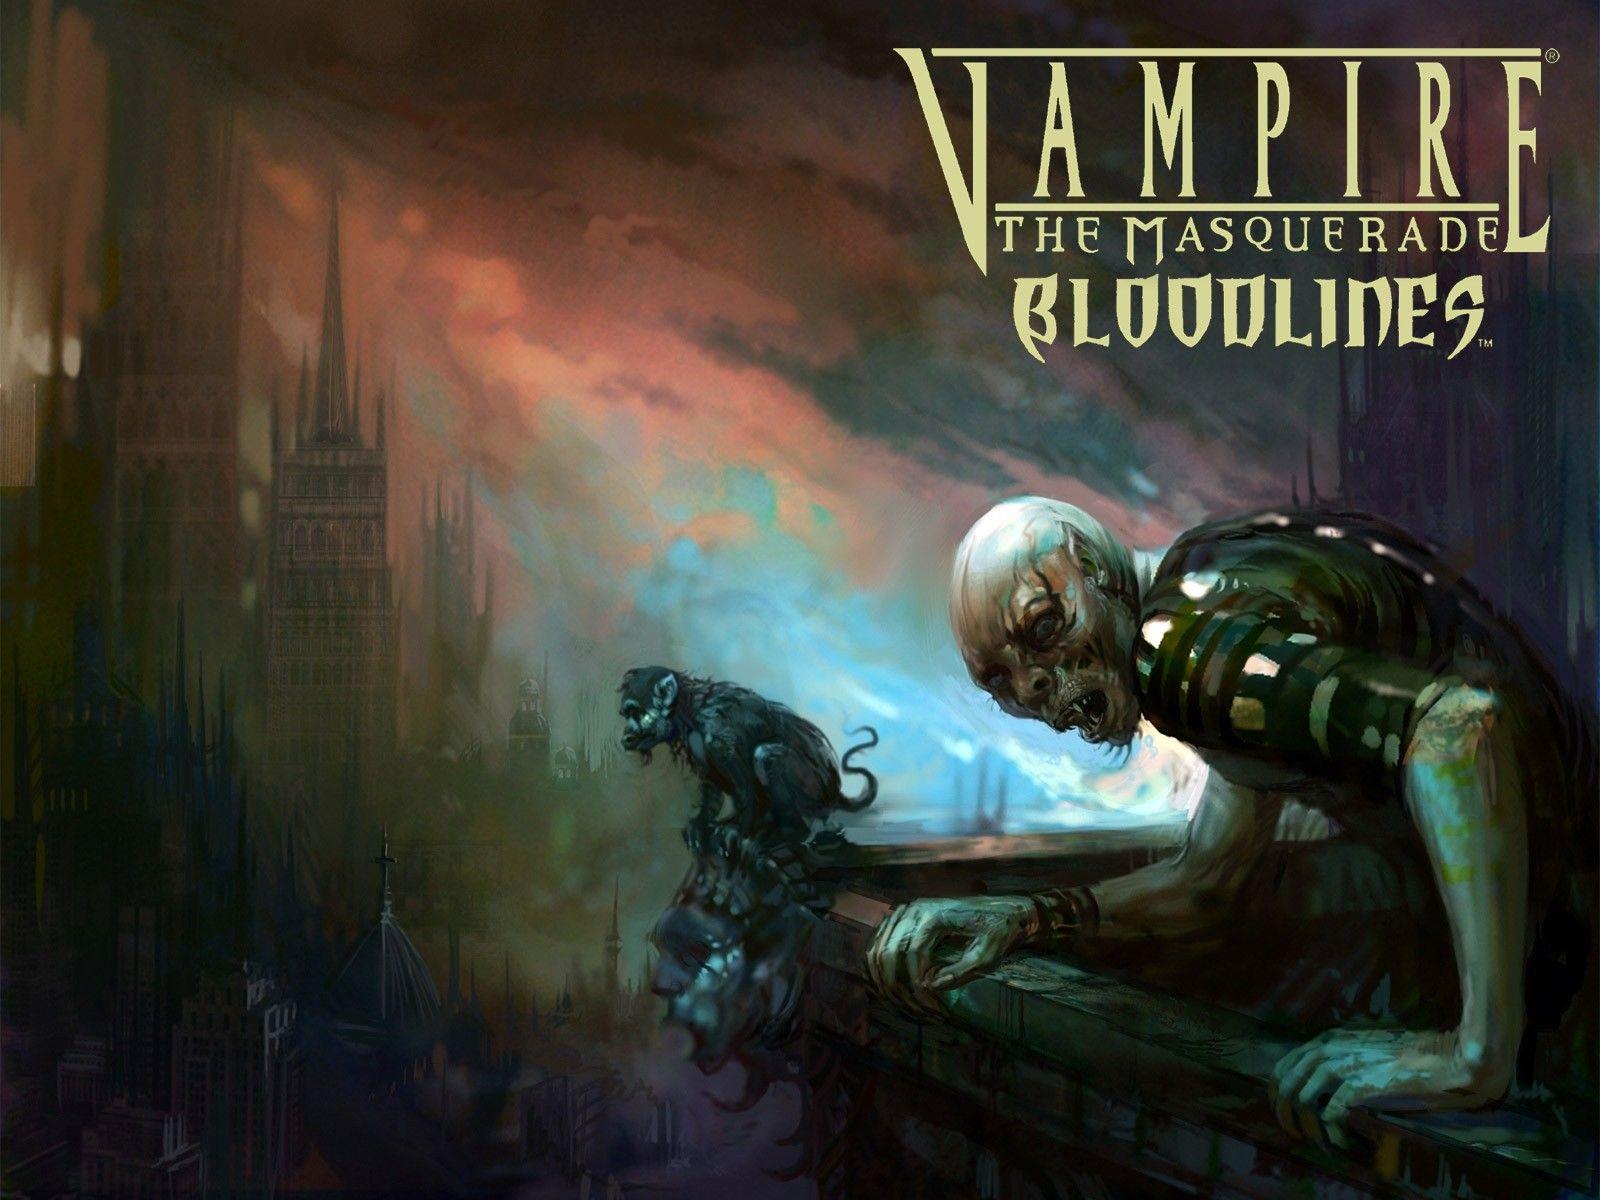 Vampire The Masquerade Bloodlines Dark Vampires Evil Wallpaper No 254008 Vampire The Masquerade Bloodlines Vampire Vampire Masquerade